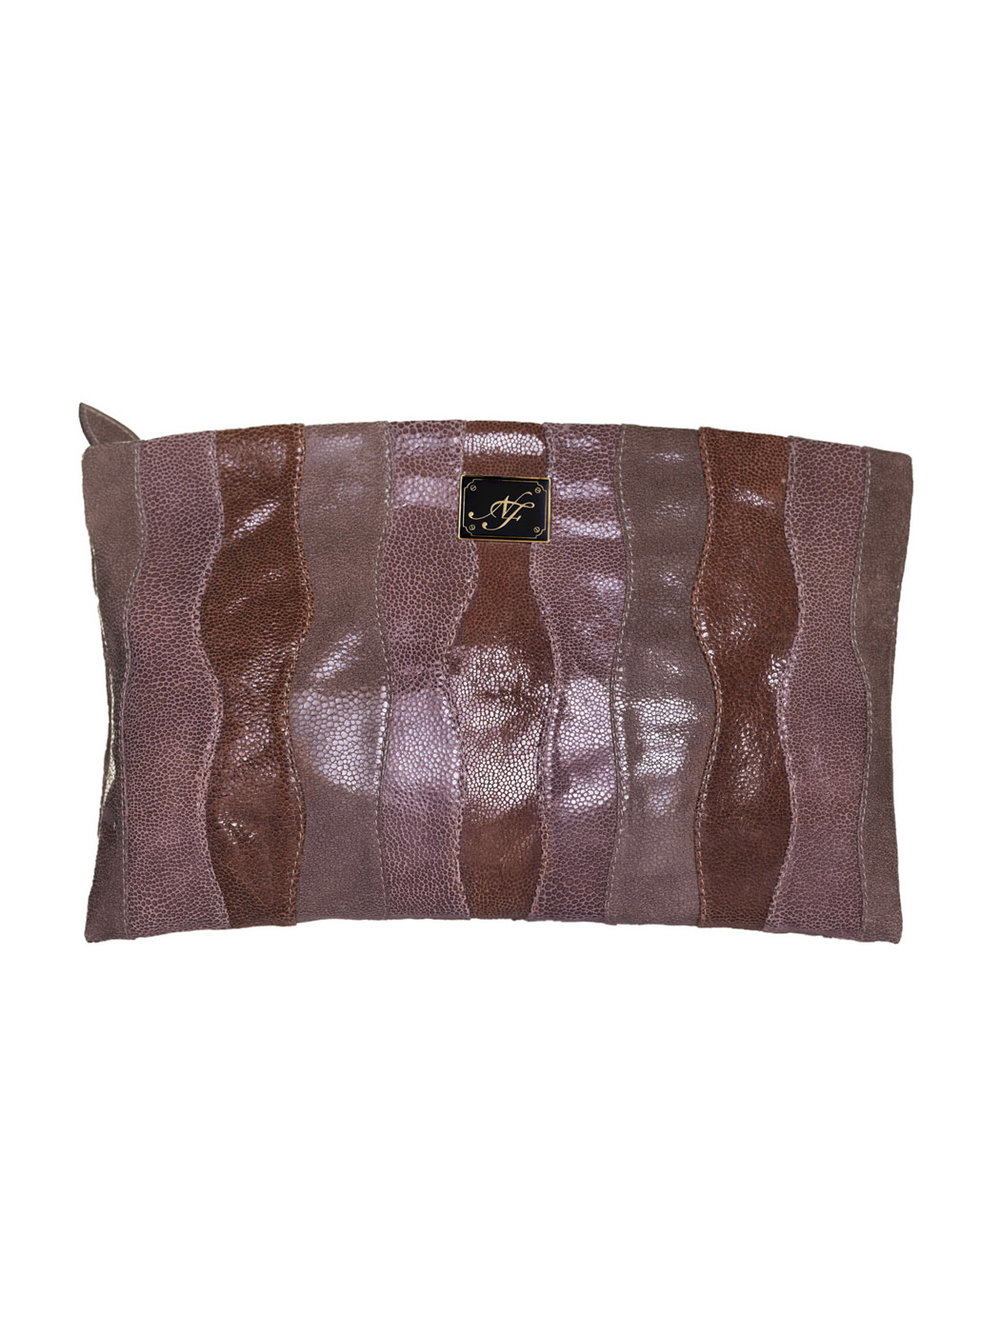 Clutch marrón - $210